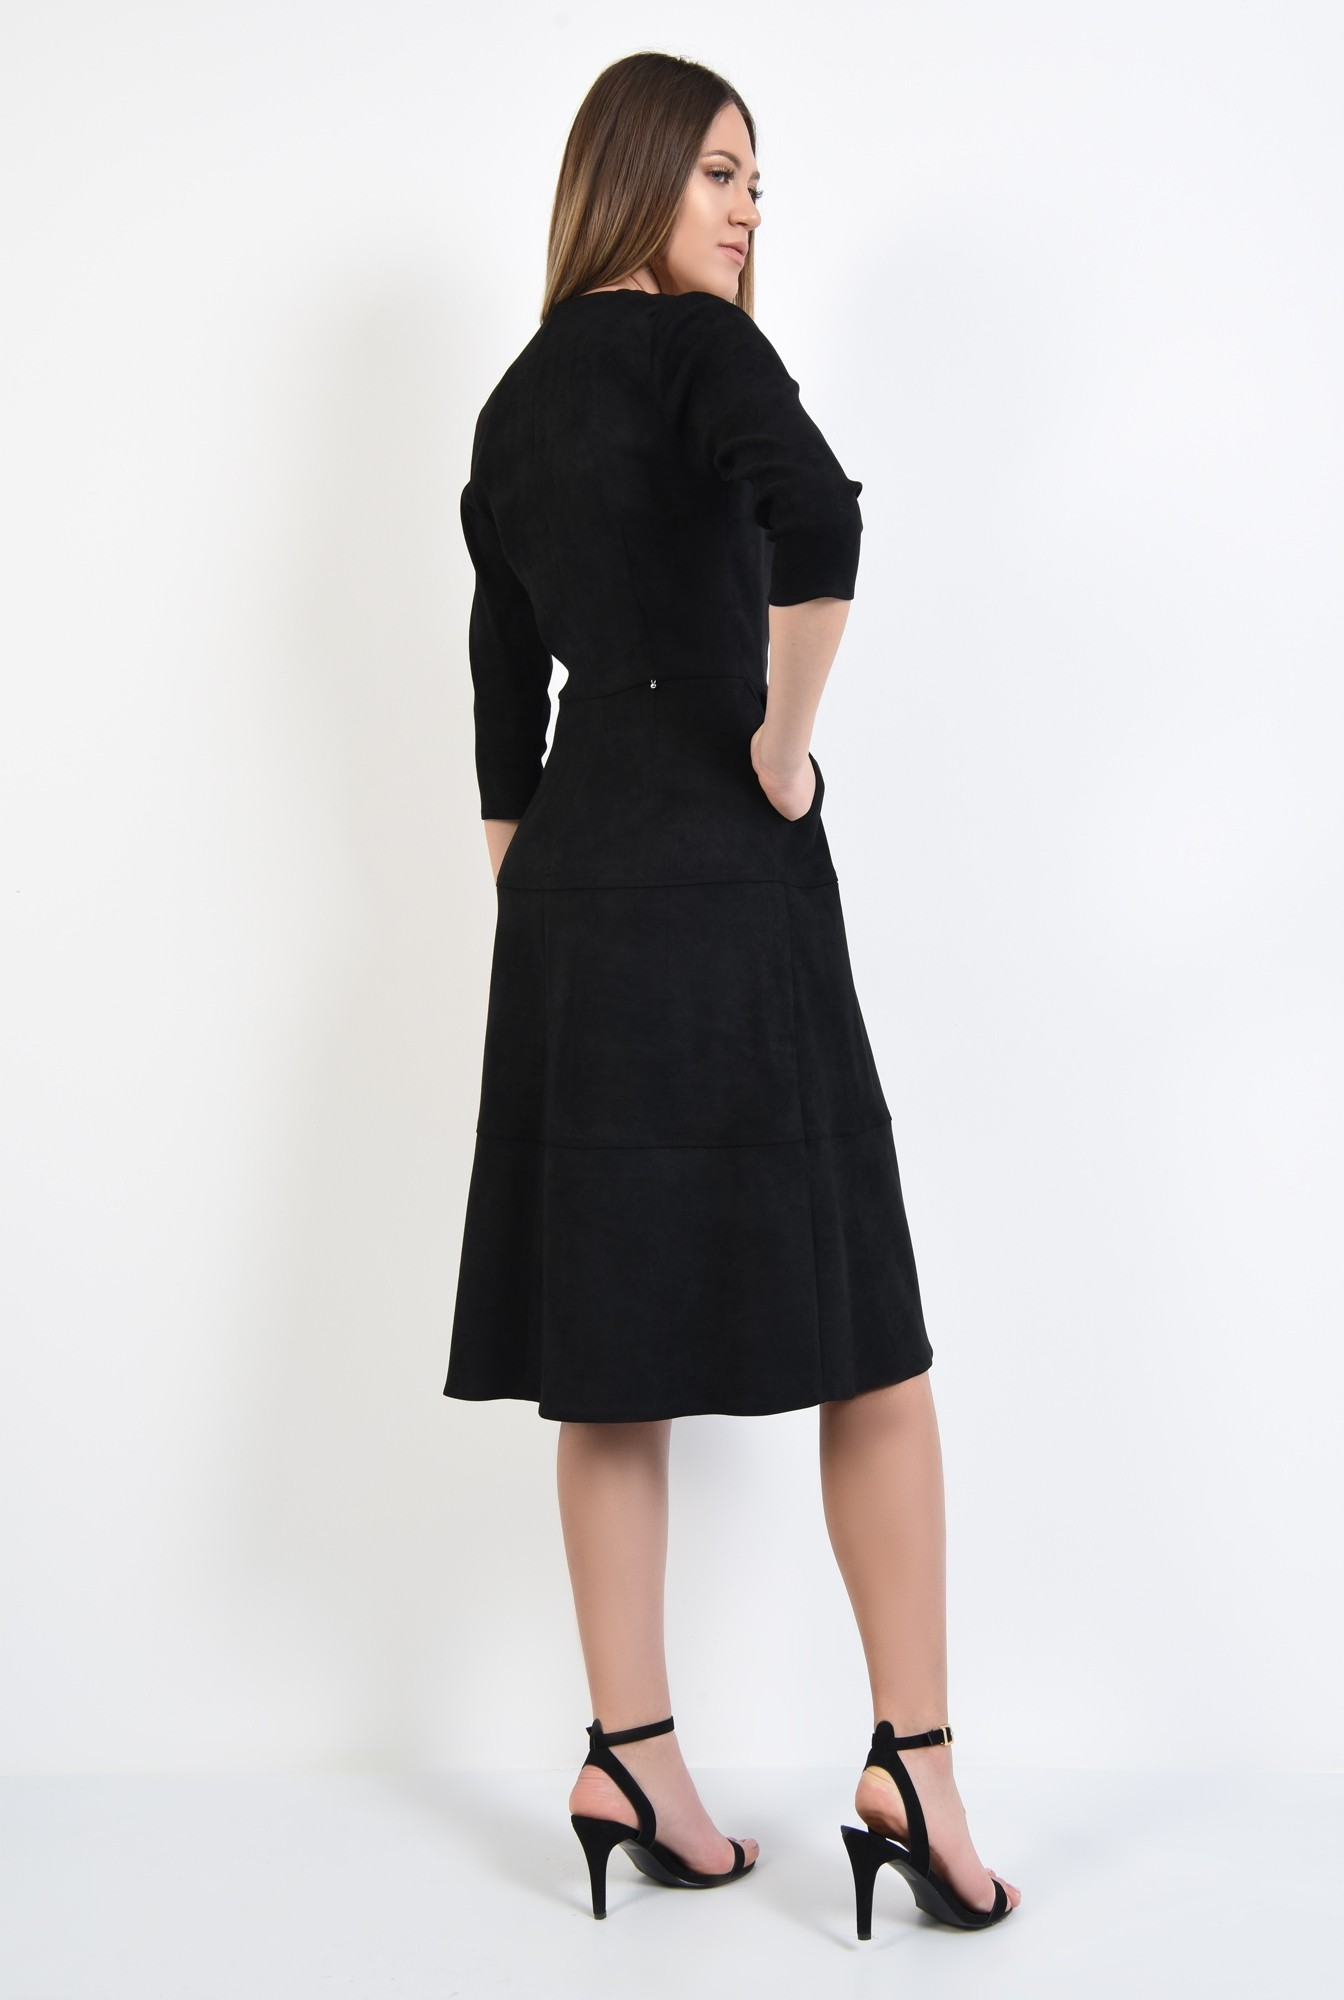 1 - rochie neagra, midi, evazata, din piele intoarsa ecologica